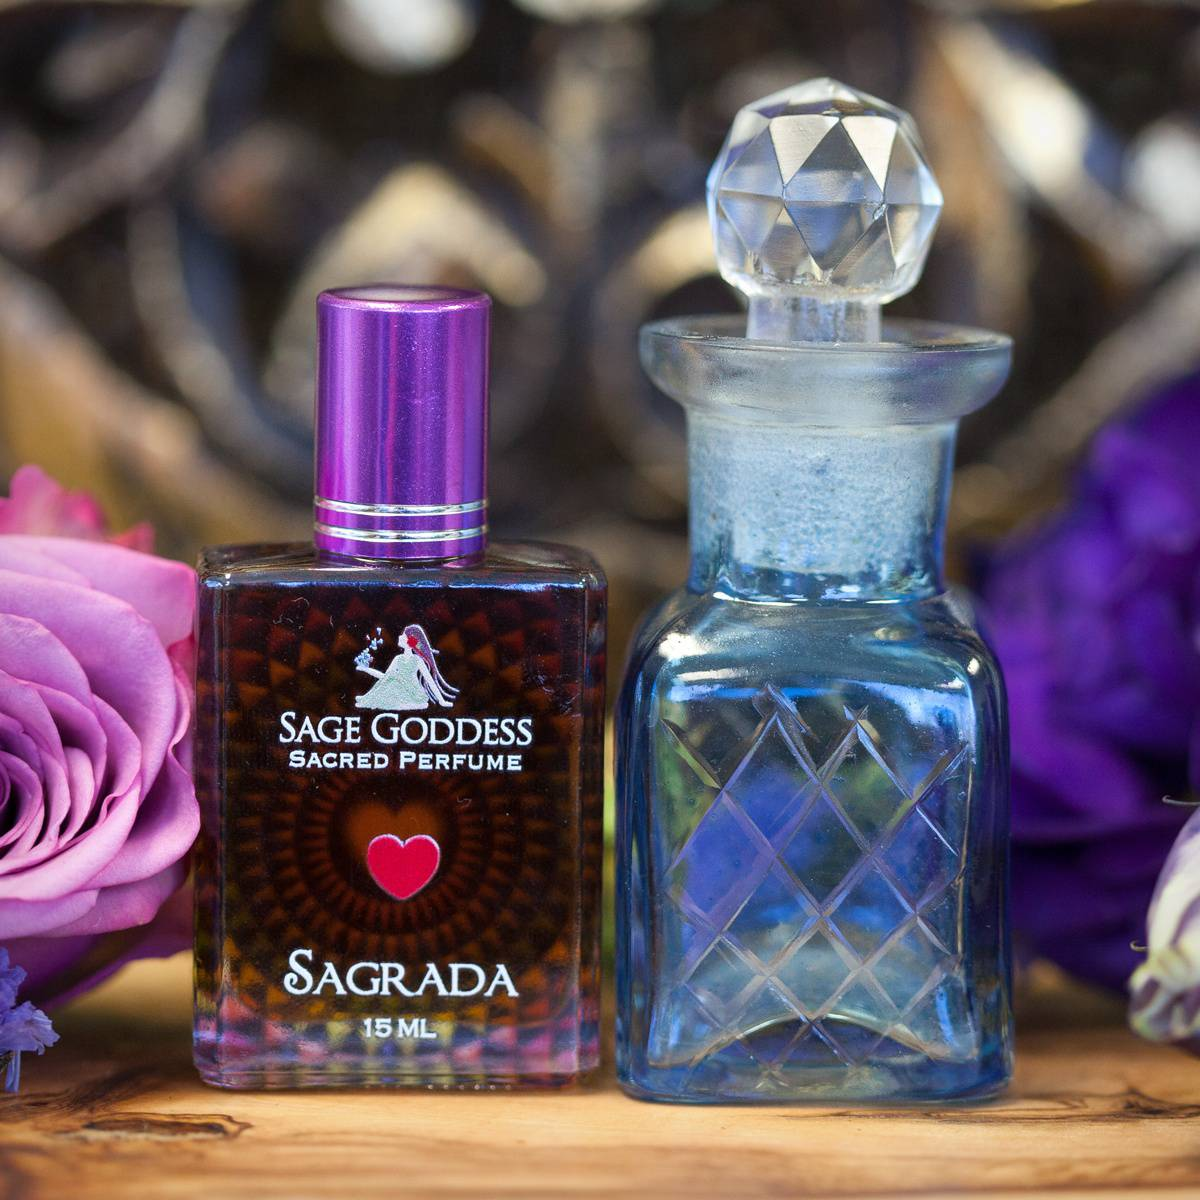 Sagrada_Perfume_with_Apothecary_Bottle_1of3_7_15